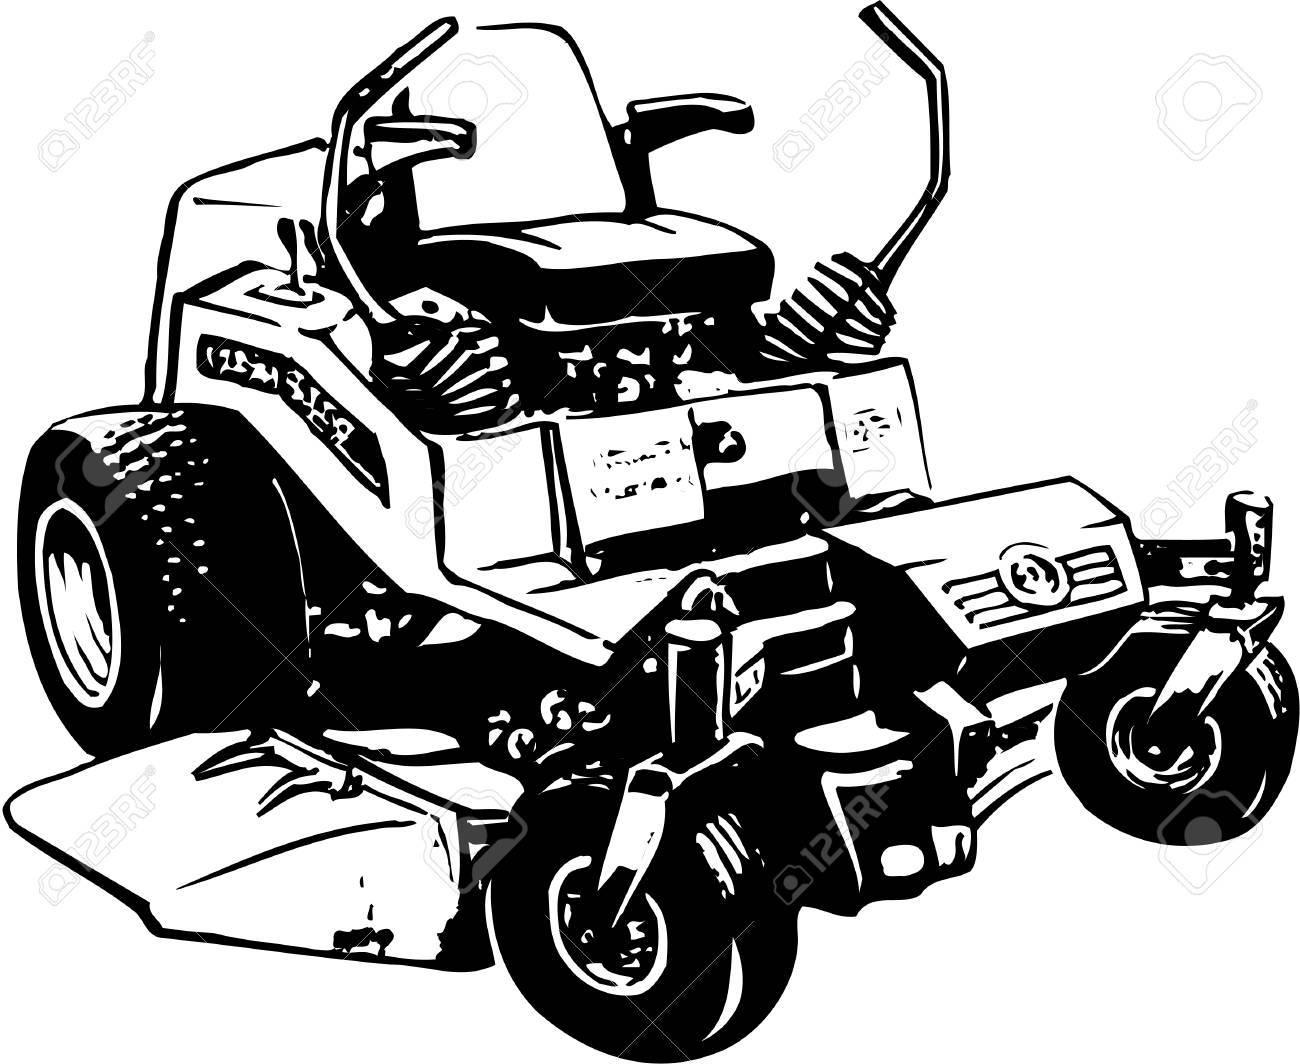 Lawn mower illustration on white background..